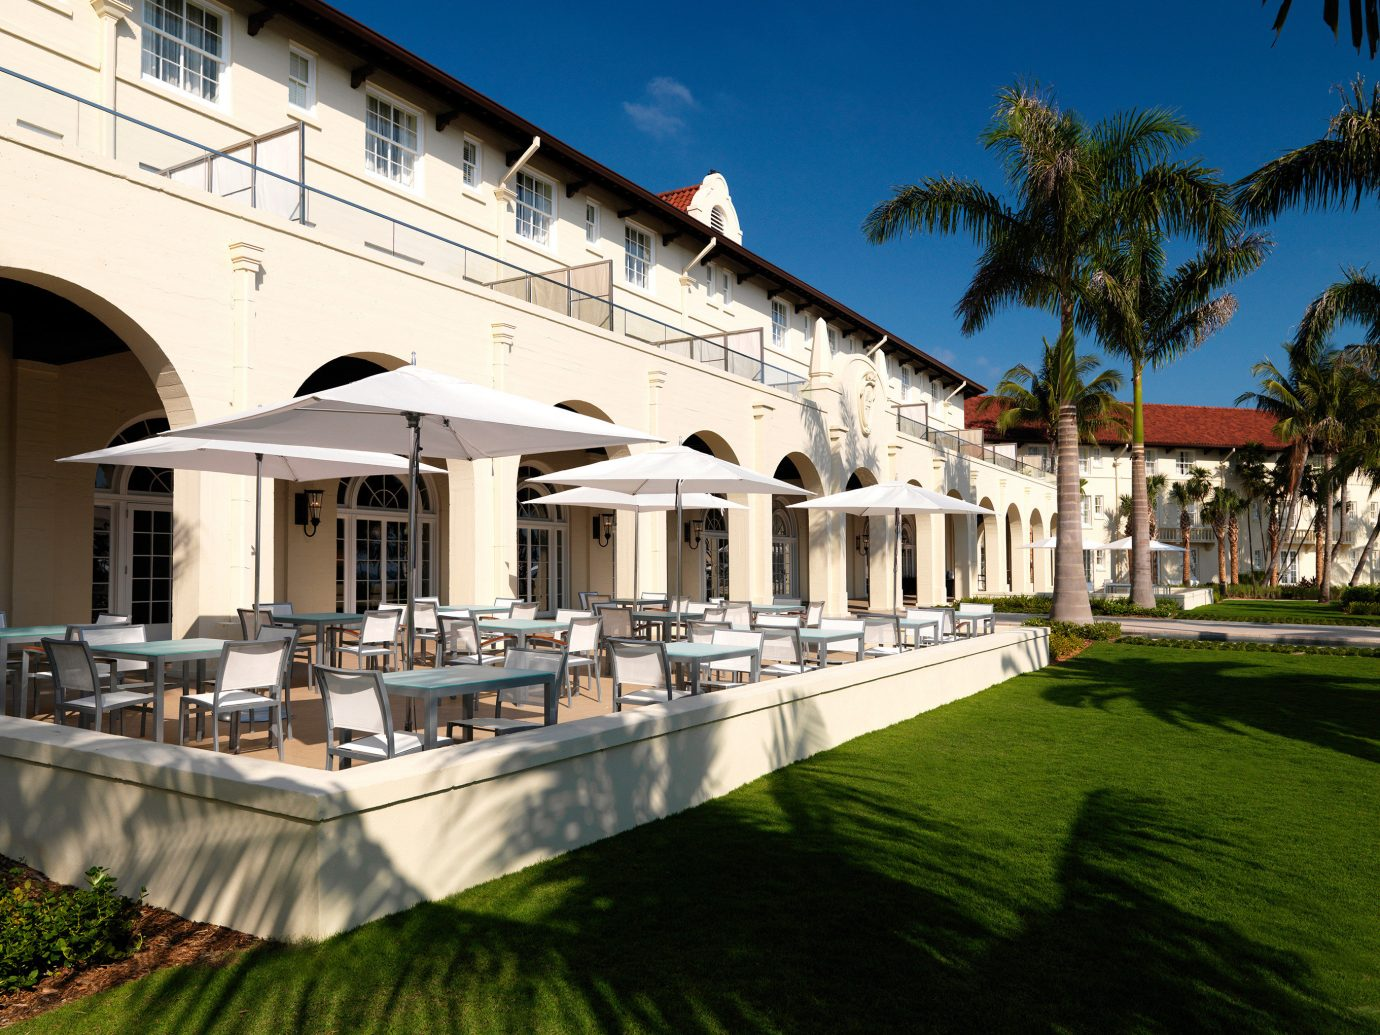 Florida Hotels sky building outdoor grass landmark green estate Architecture palace facade Resort Villa mansion waterway